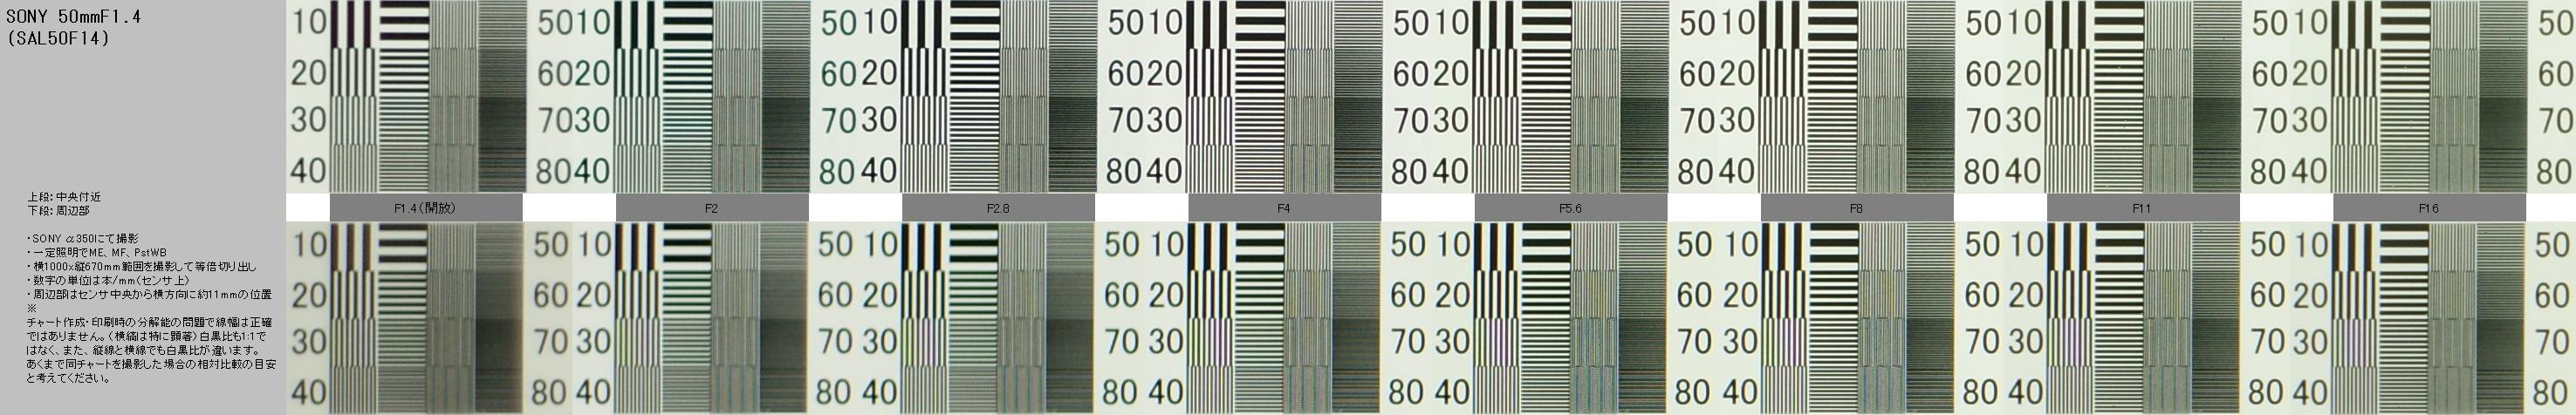 оптическая схема объектива ноктилюкс 50/0,95